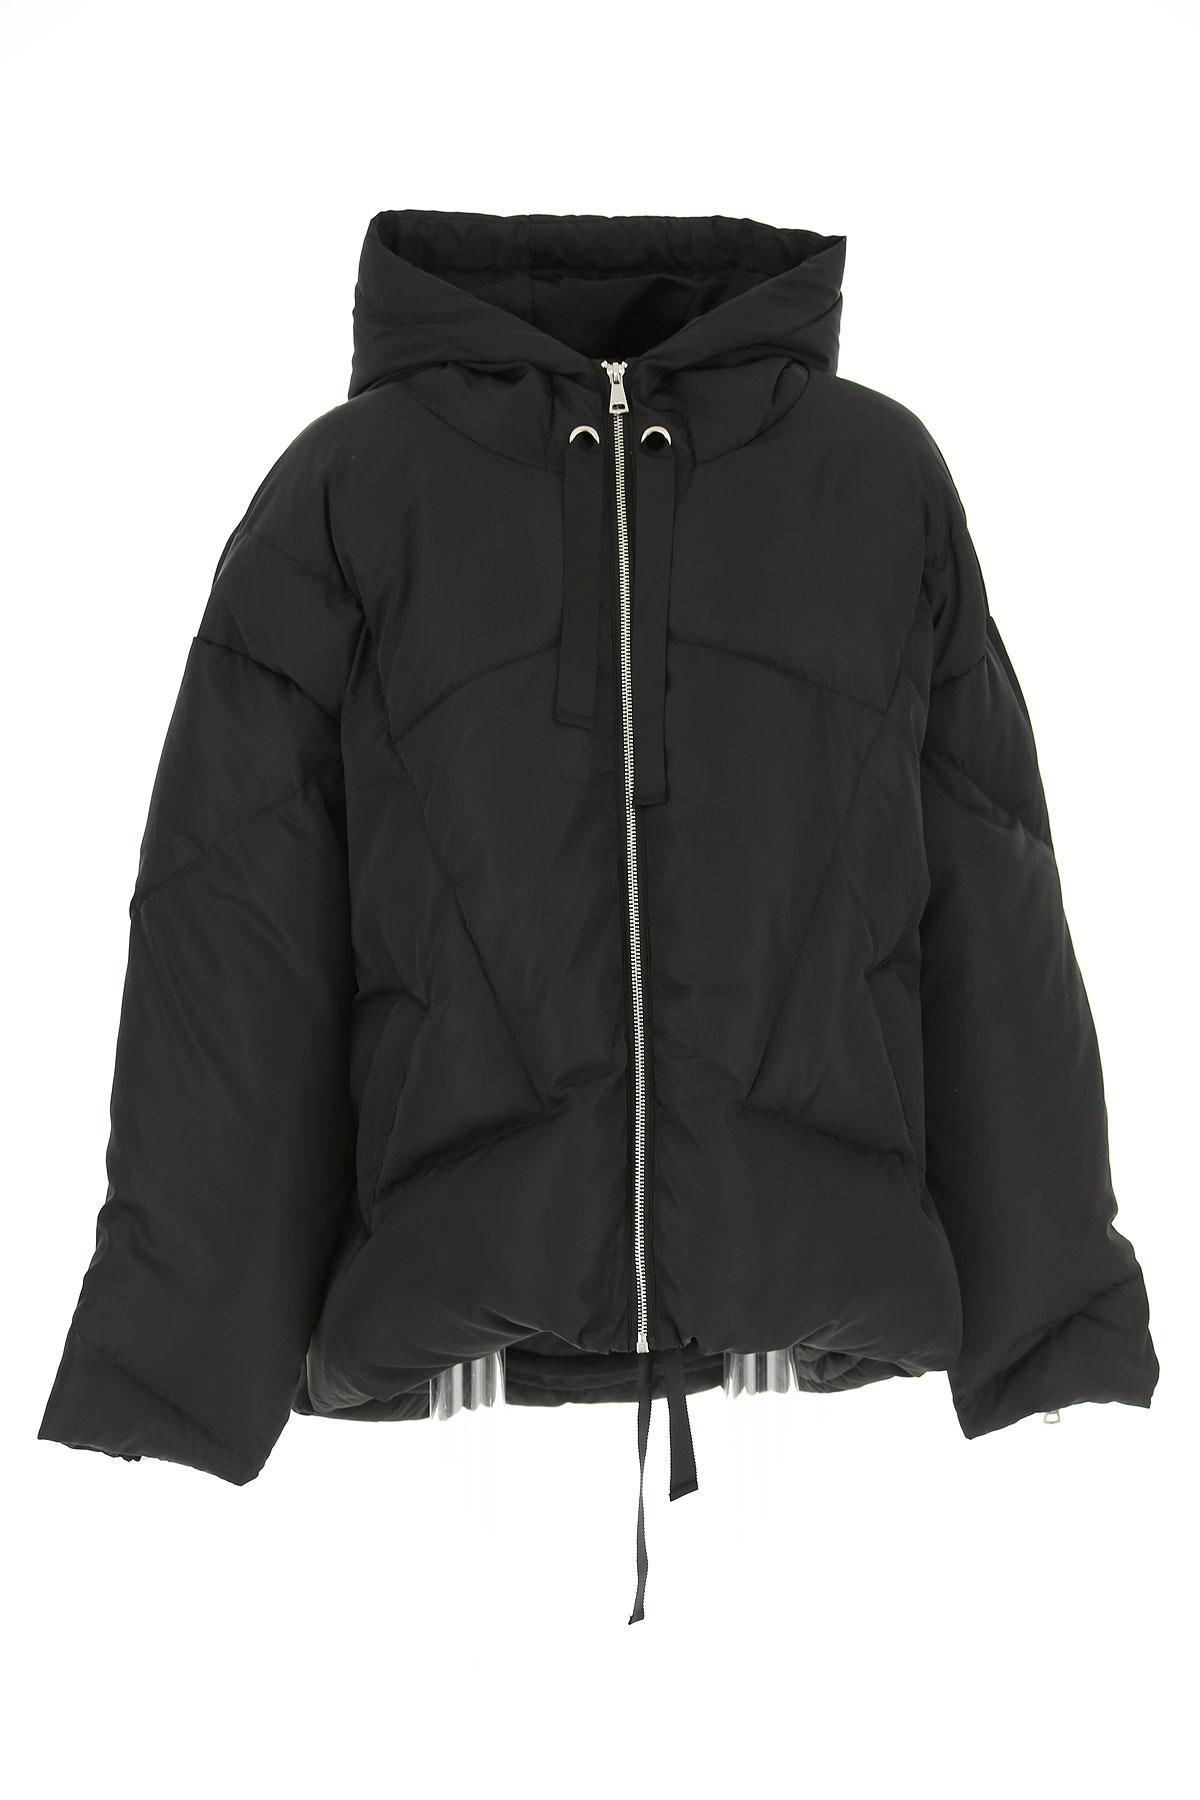 Image of ESSENTIEL Antwerp Down Jacket for Women, Puffer Ski Jacket, Black, polyamide, 2017, 6